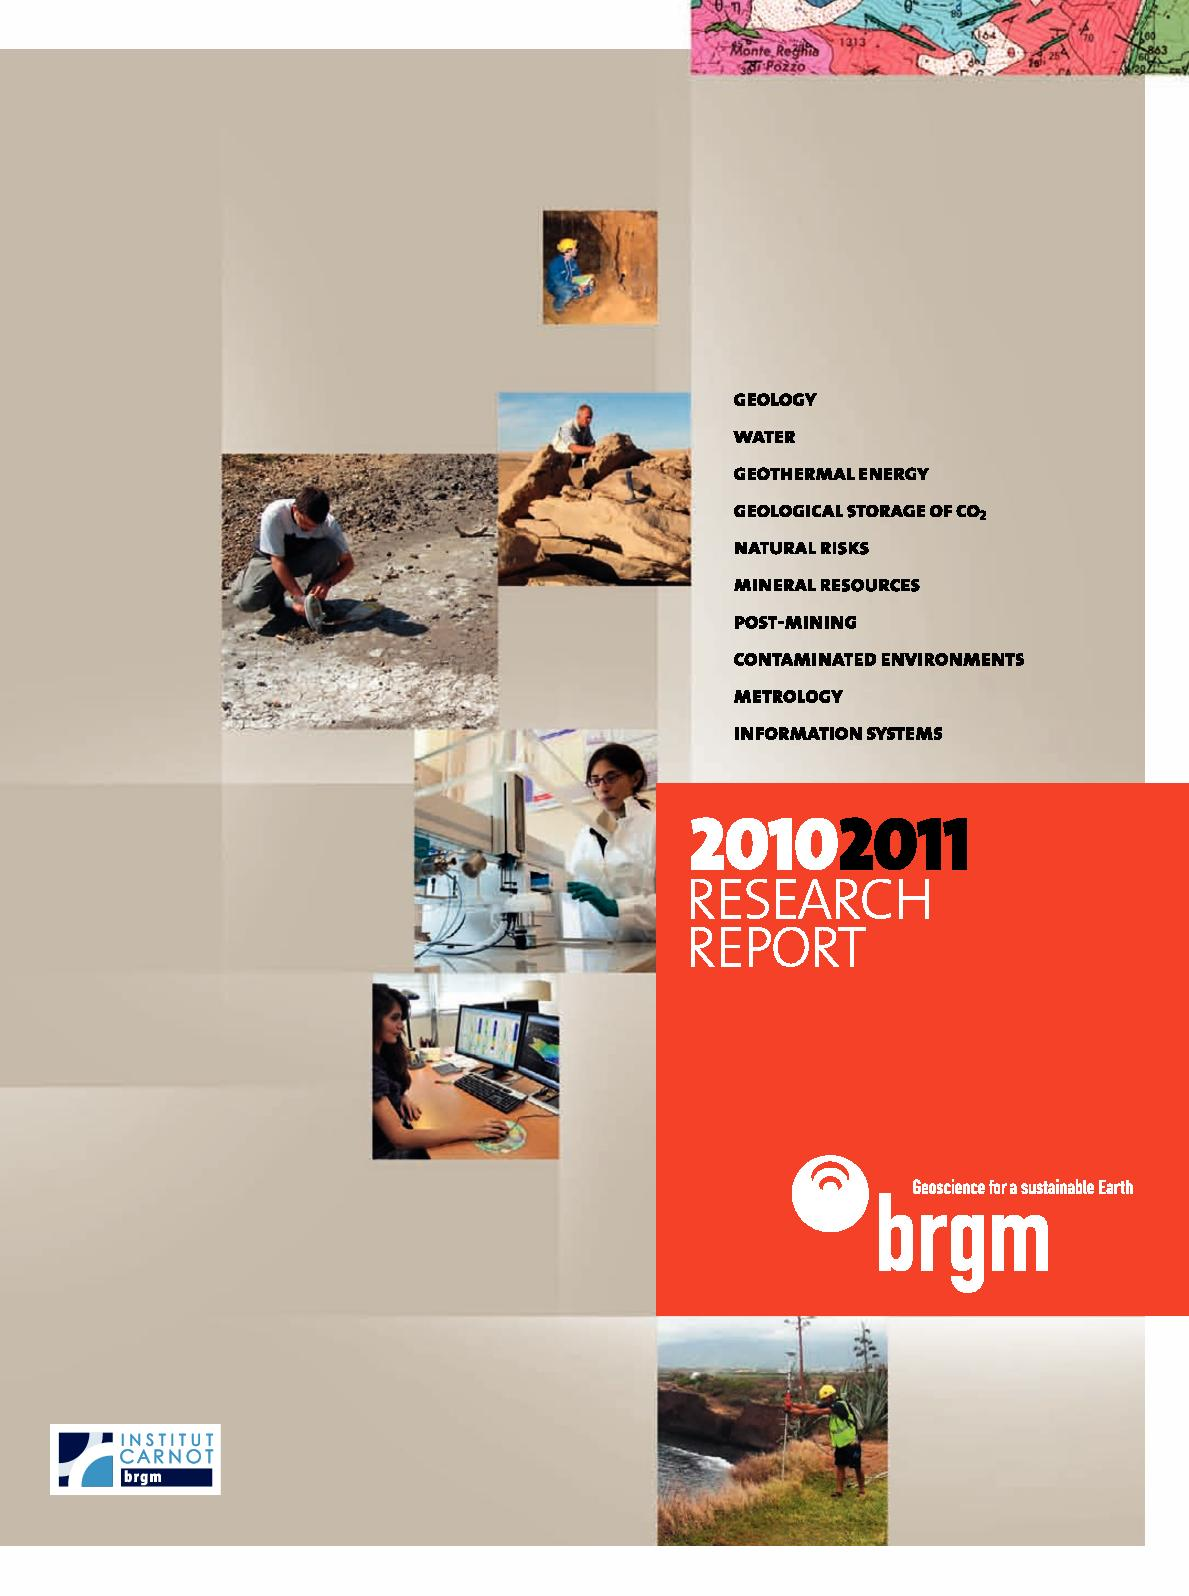 Calaméo - 2010-2011 Research Report | BRGM